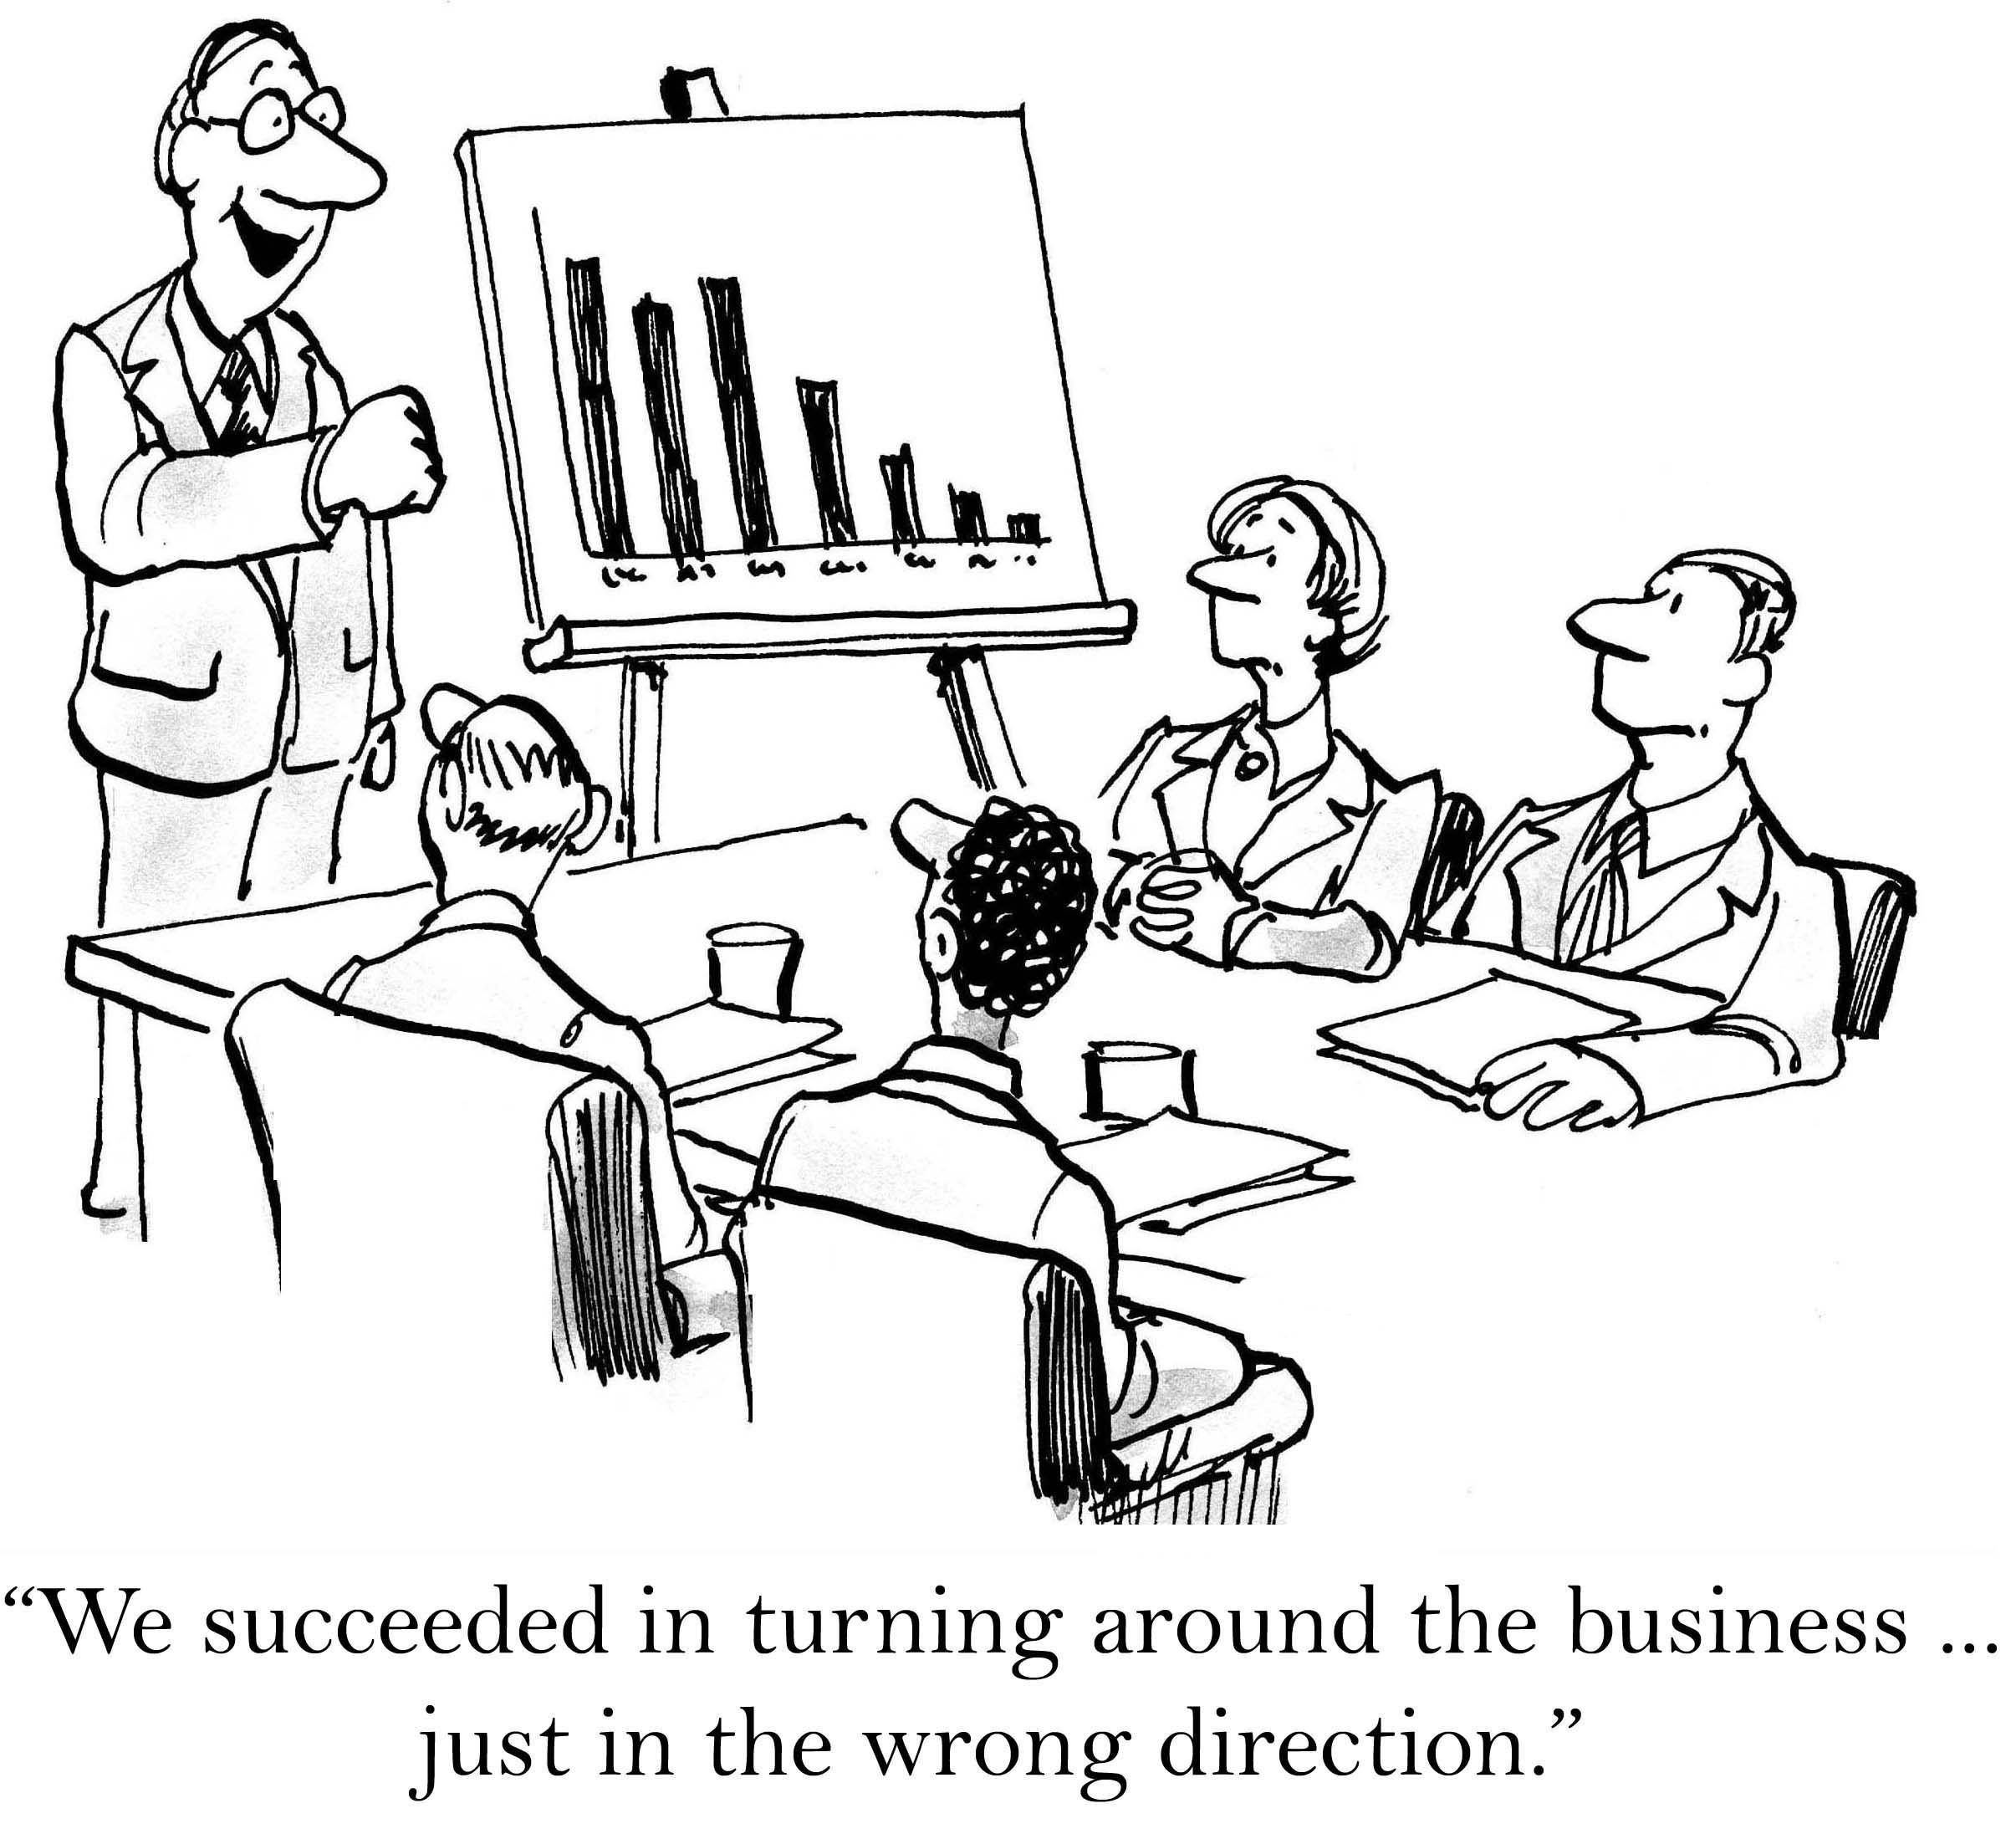 impact of customer churn